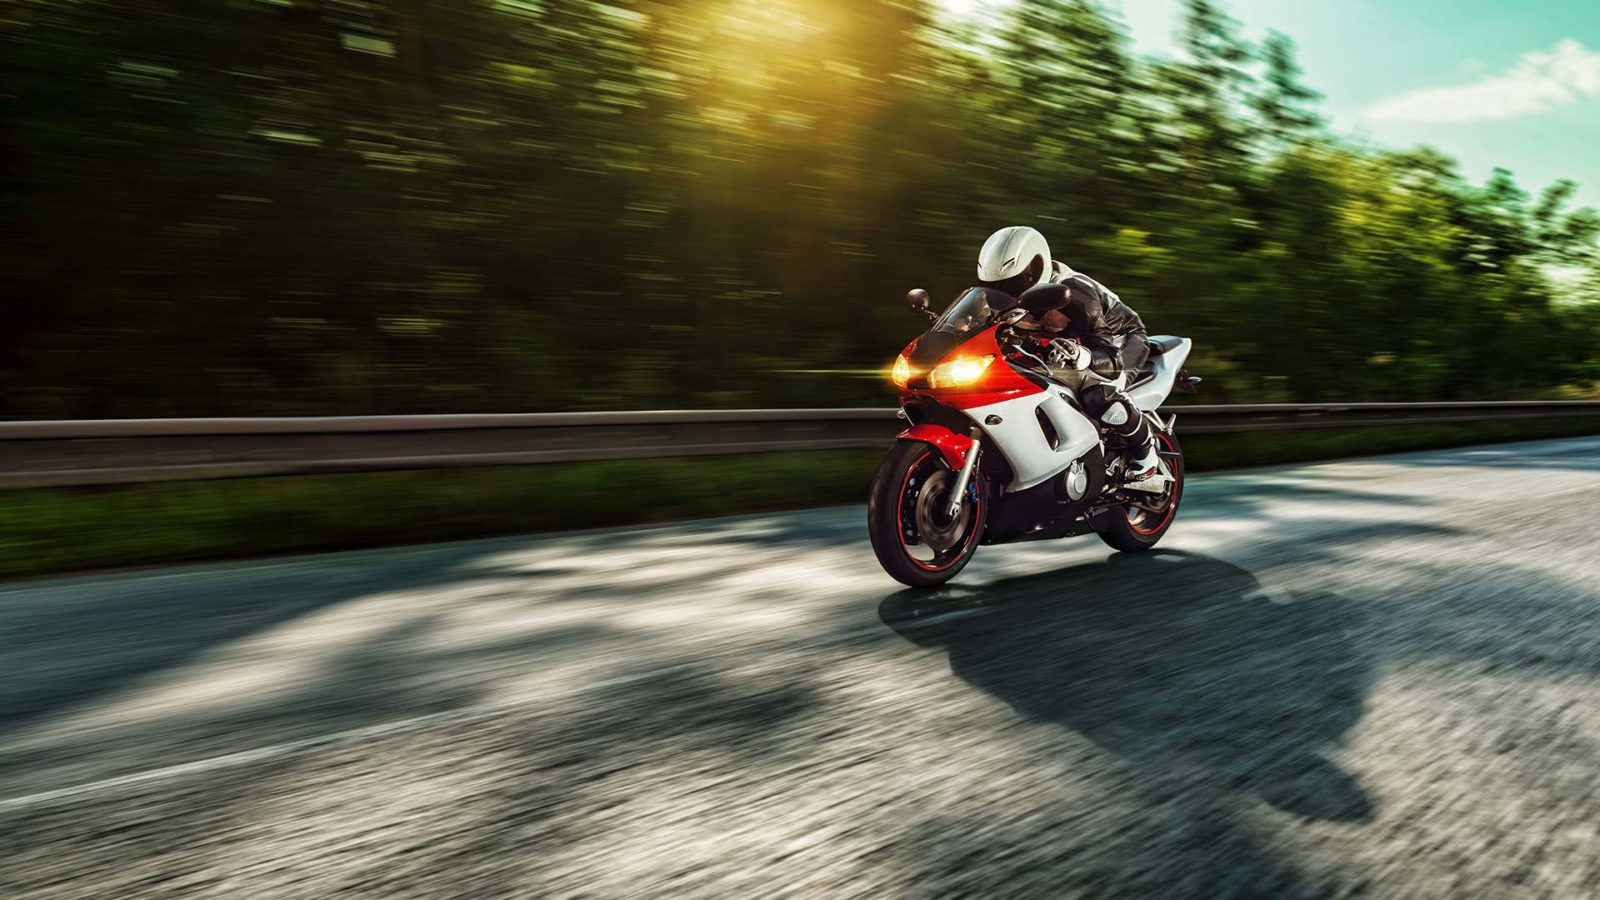 Motorcycle Insurance in Laconia, Tilton, NH, Braintree, Abington, MA,